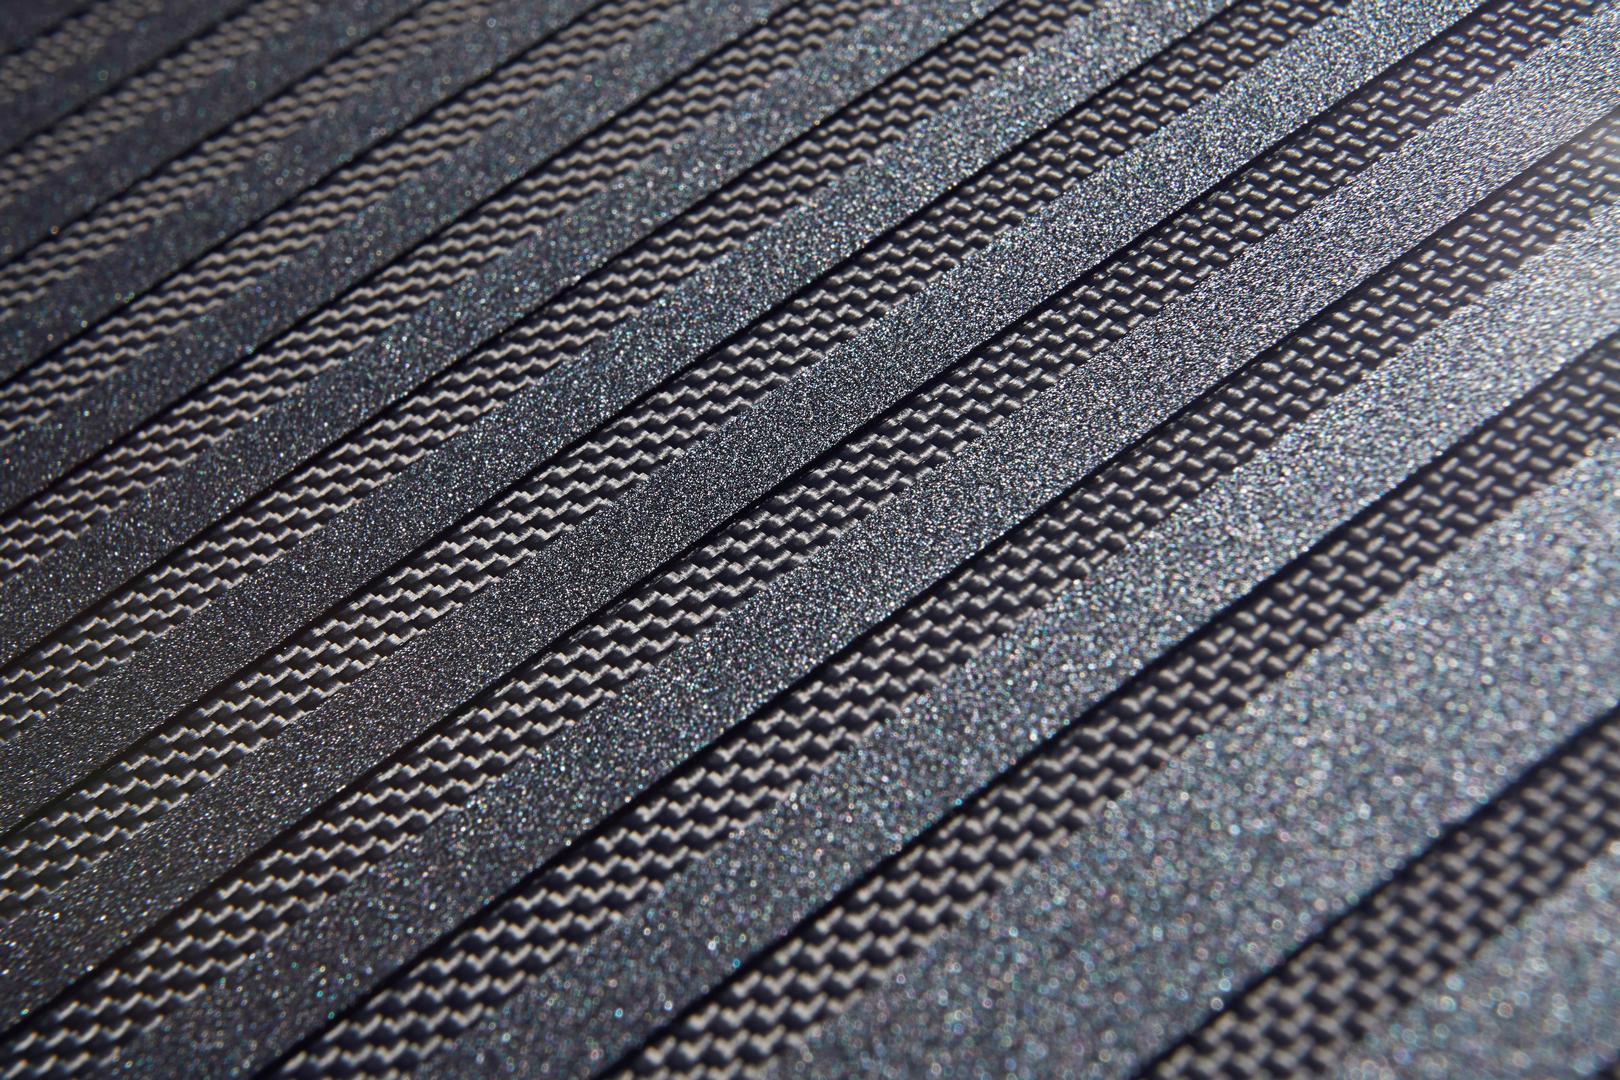 McLaren Speedtail details